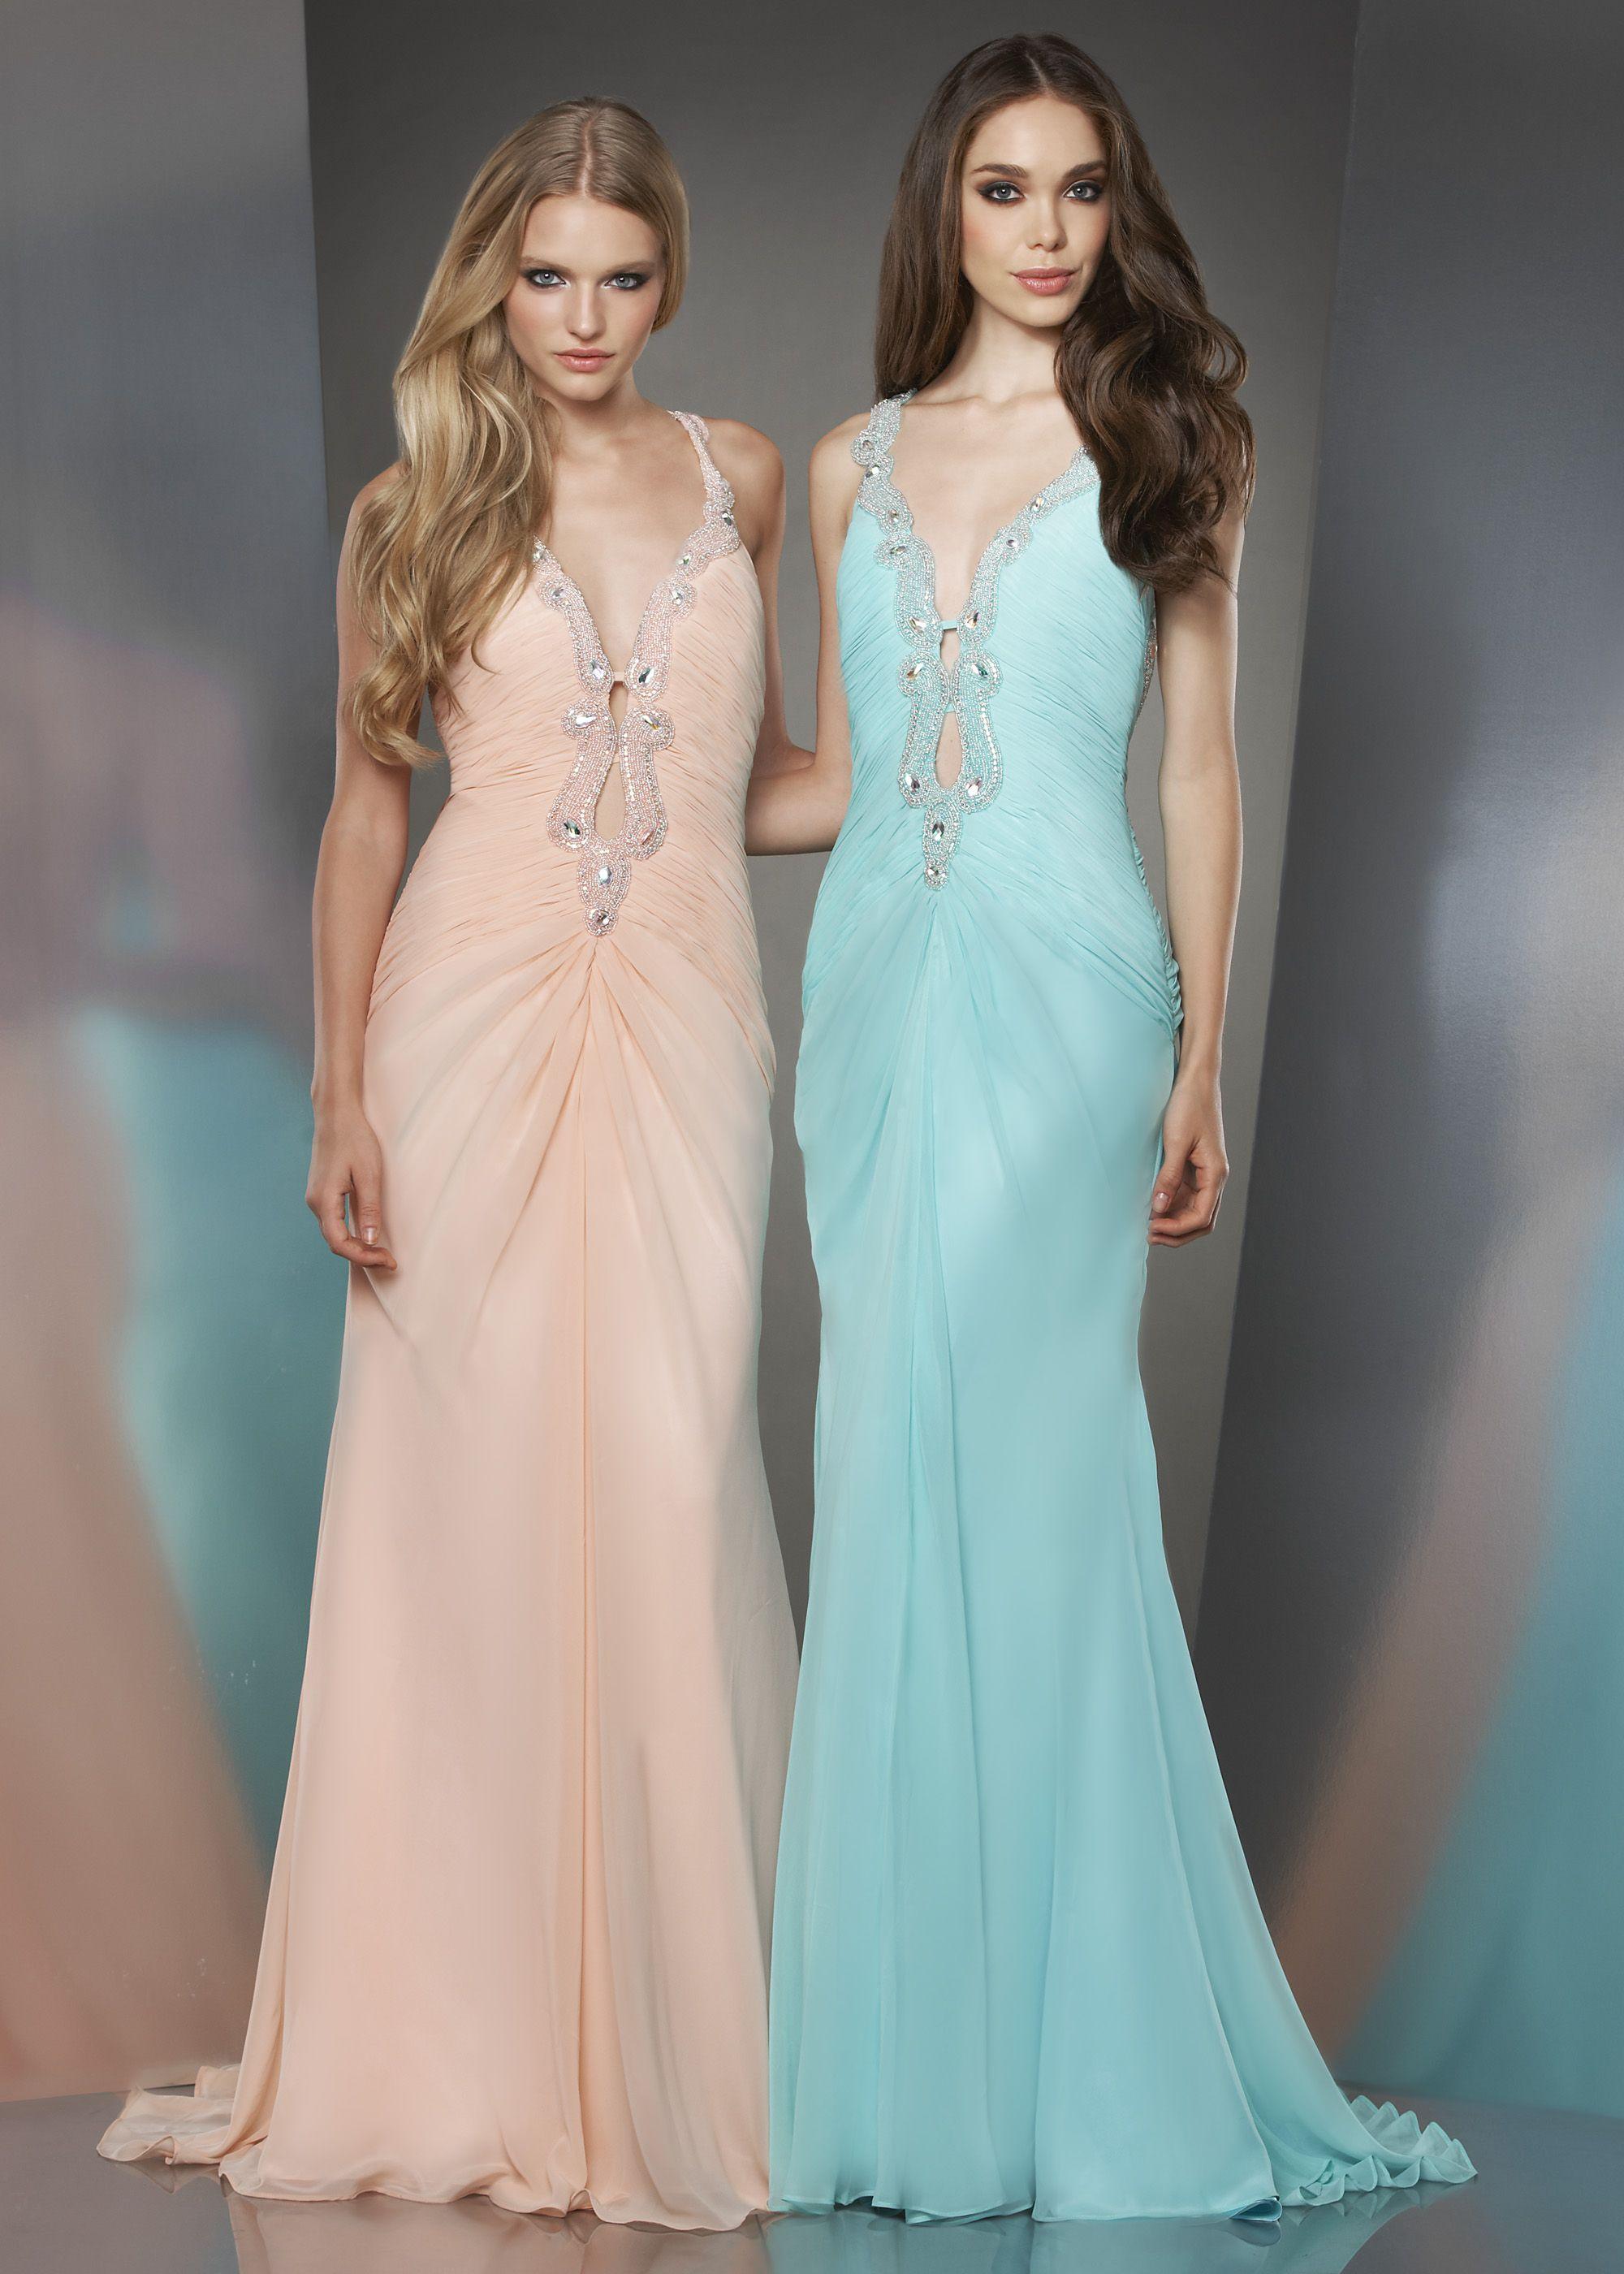 Shimmer by Bari Jay 59803 - Peach, Mint Shirred Chiffon Prom Dresses ...